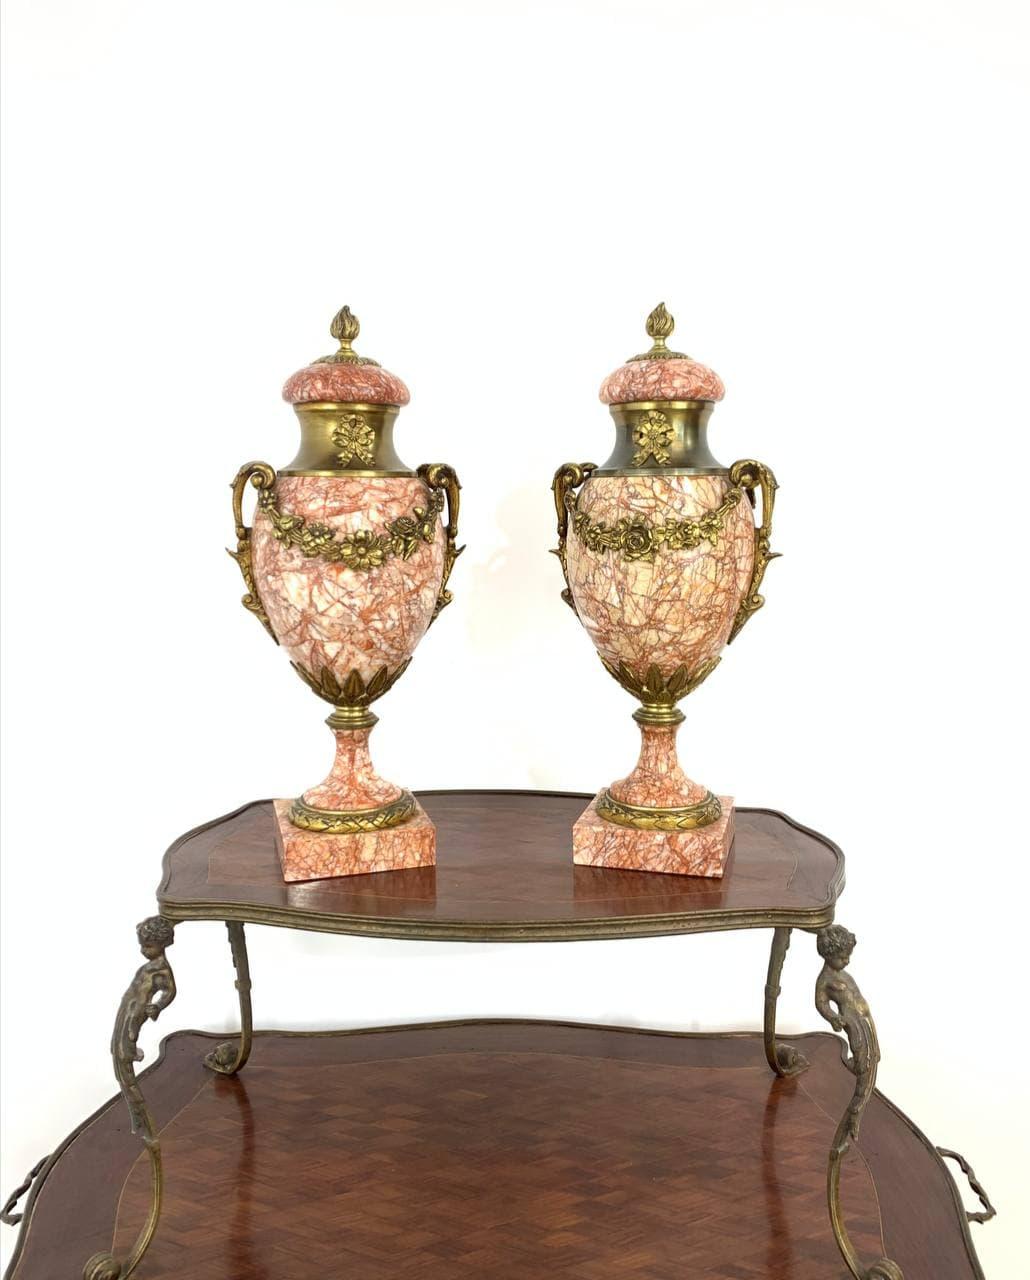 Антикварная пара ваз из мрамора